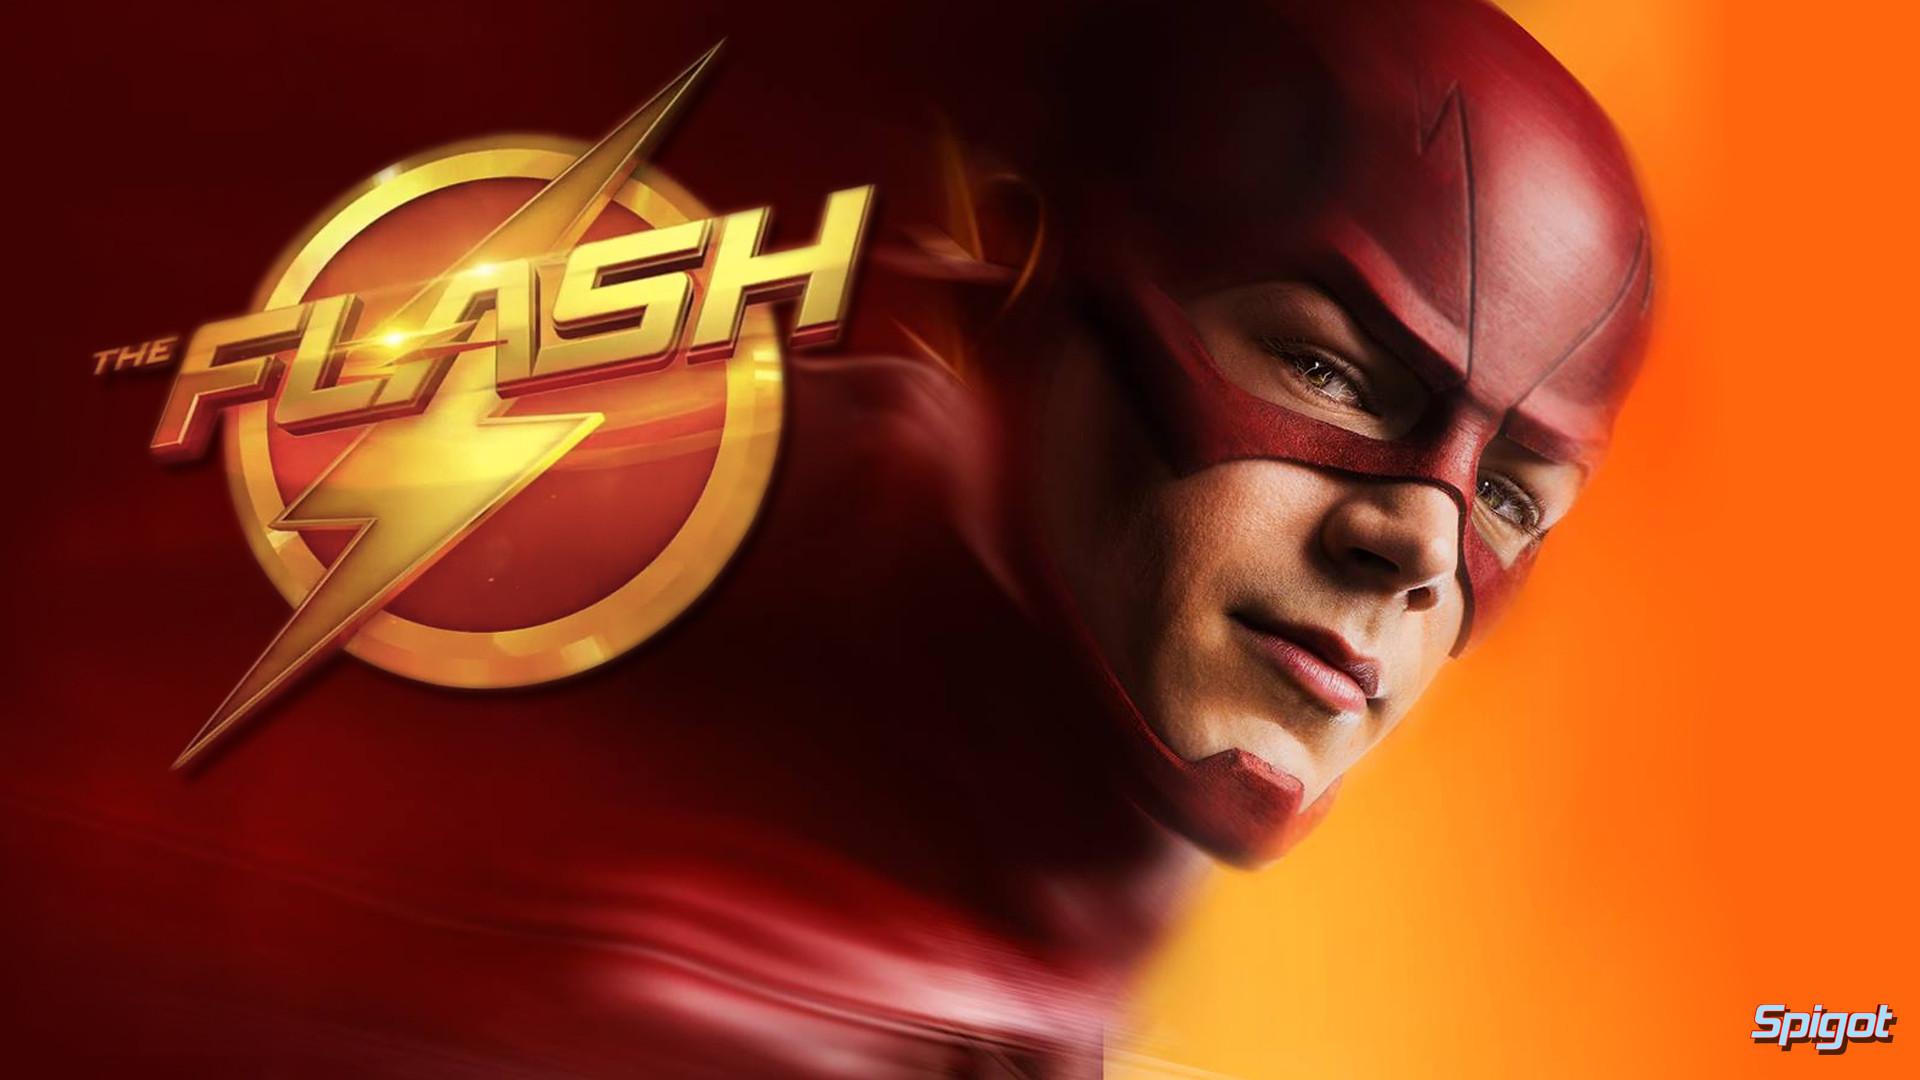 The Flash 2014 – 01